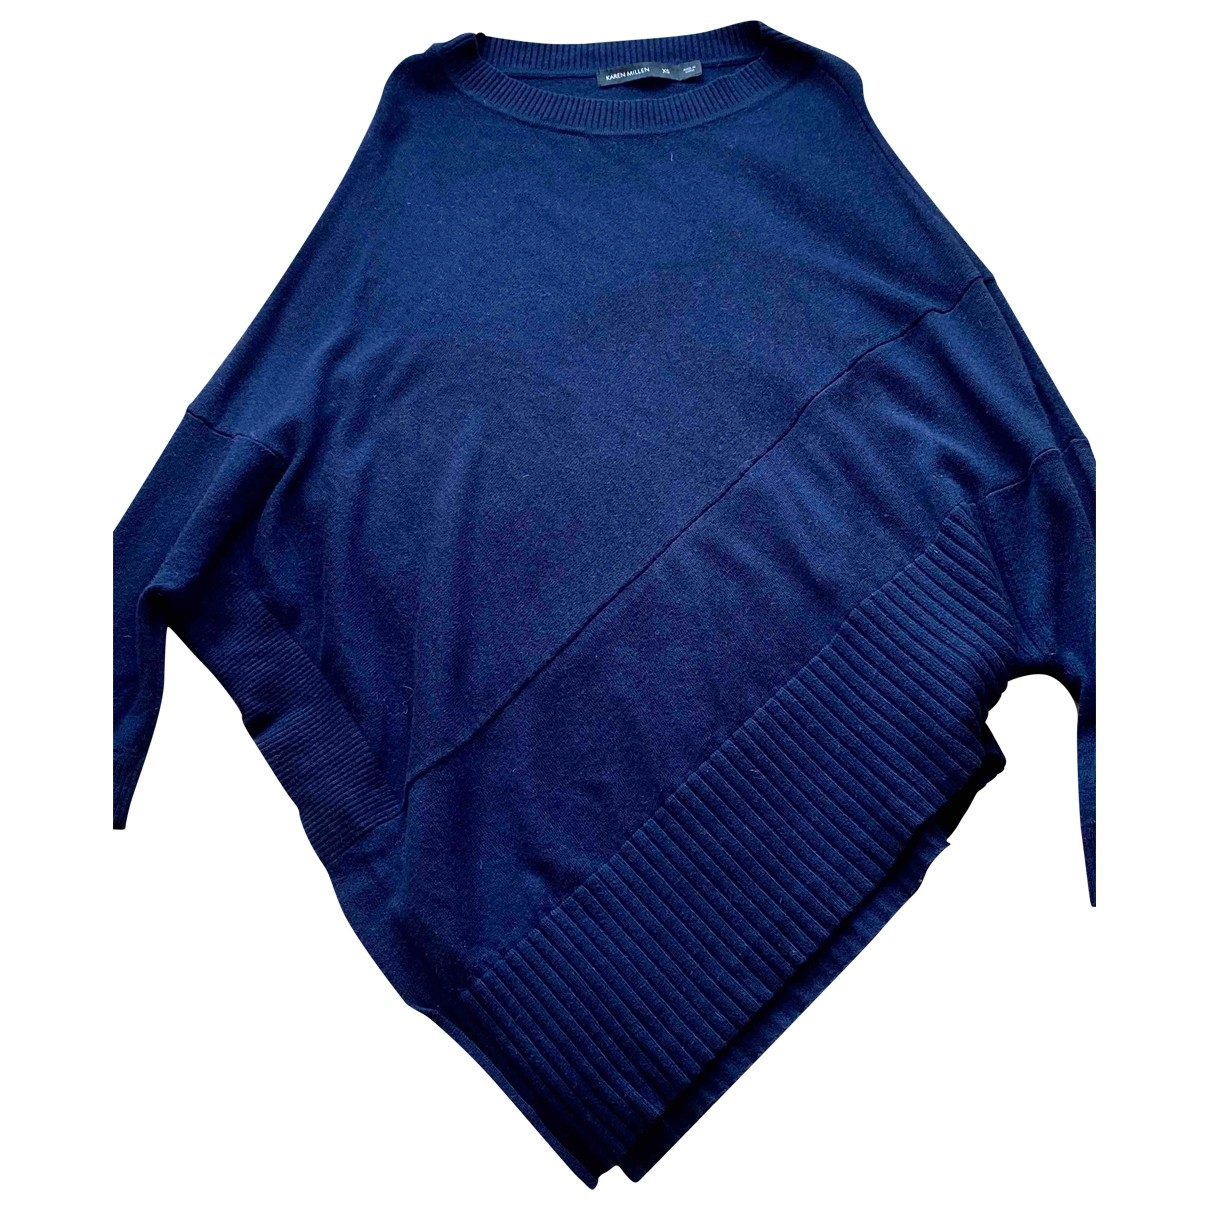 Karen Millen \N Navy Wool Knitwear for Women XS International